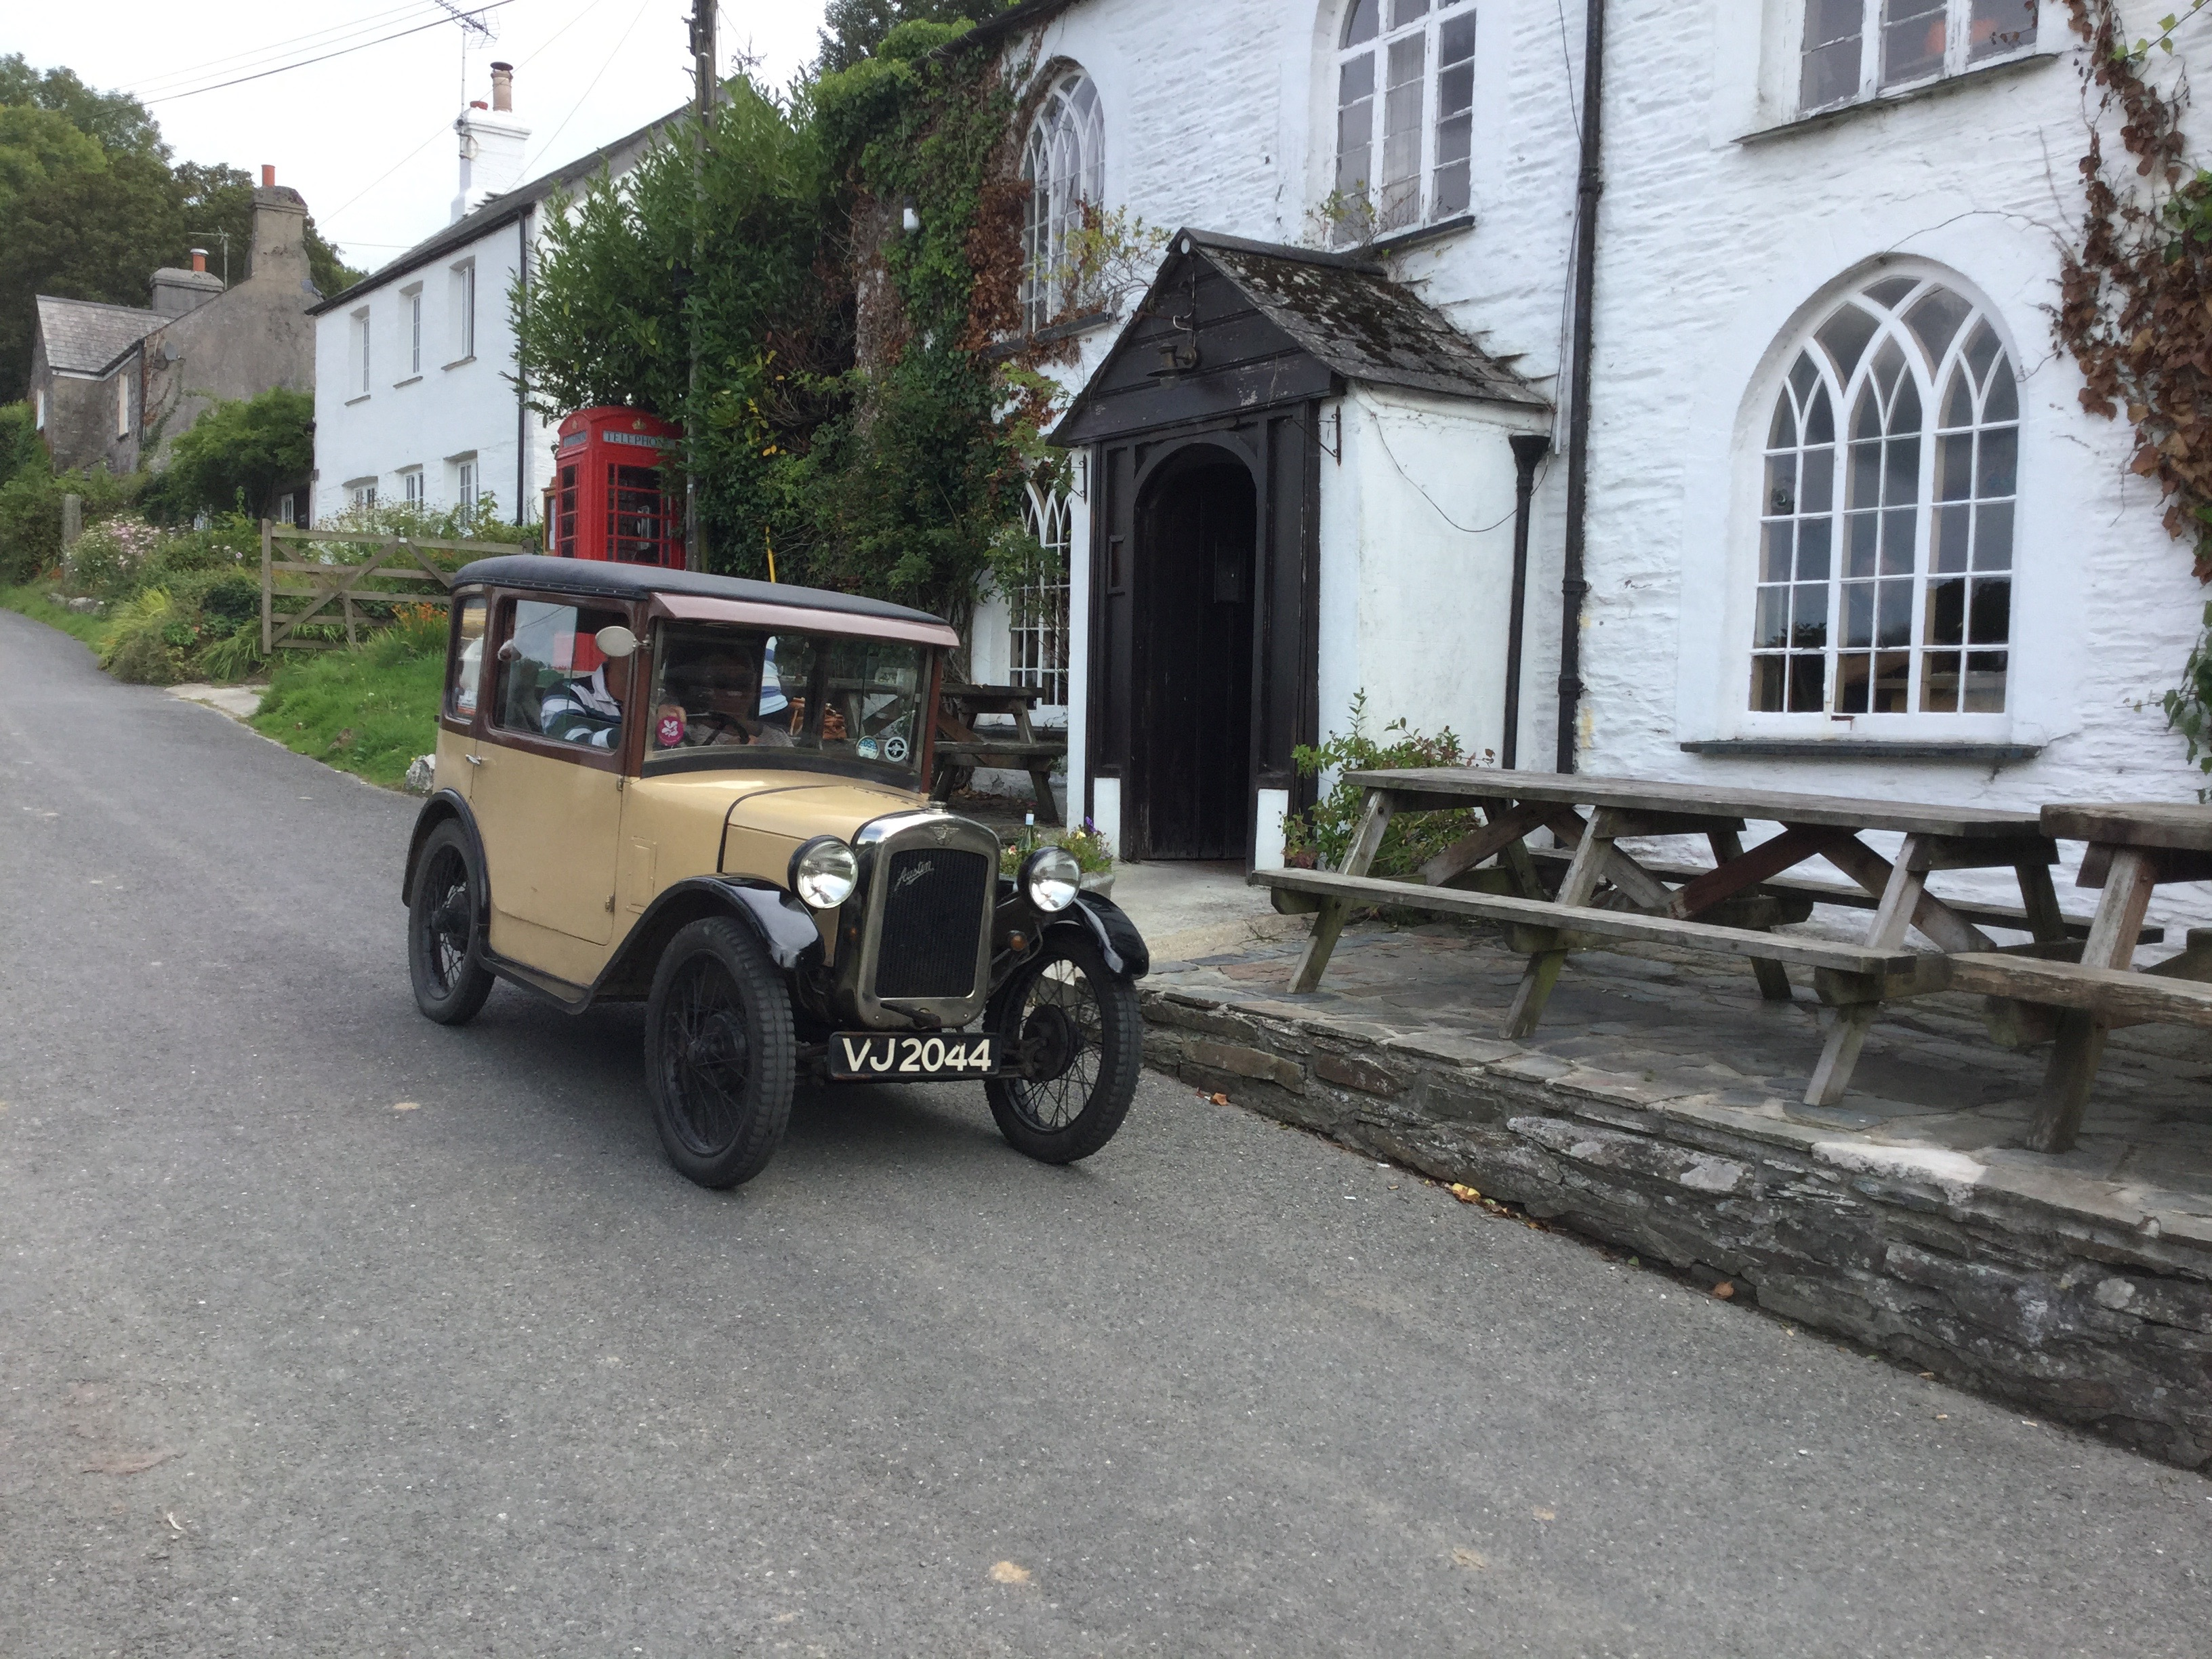 Car rally at the pub